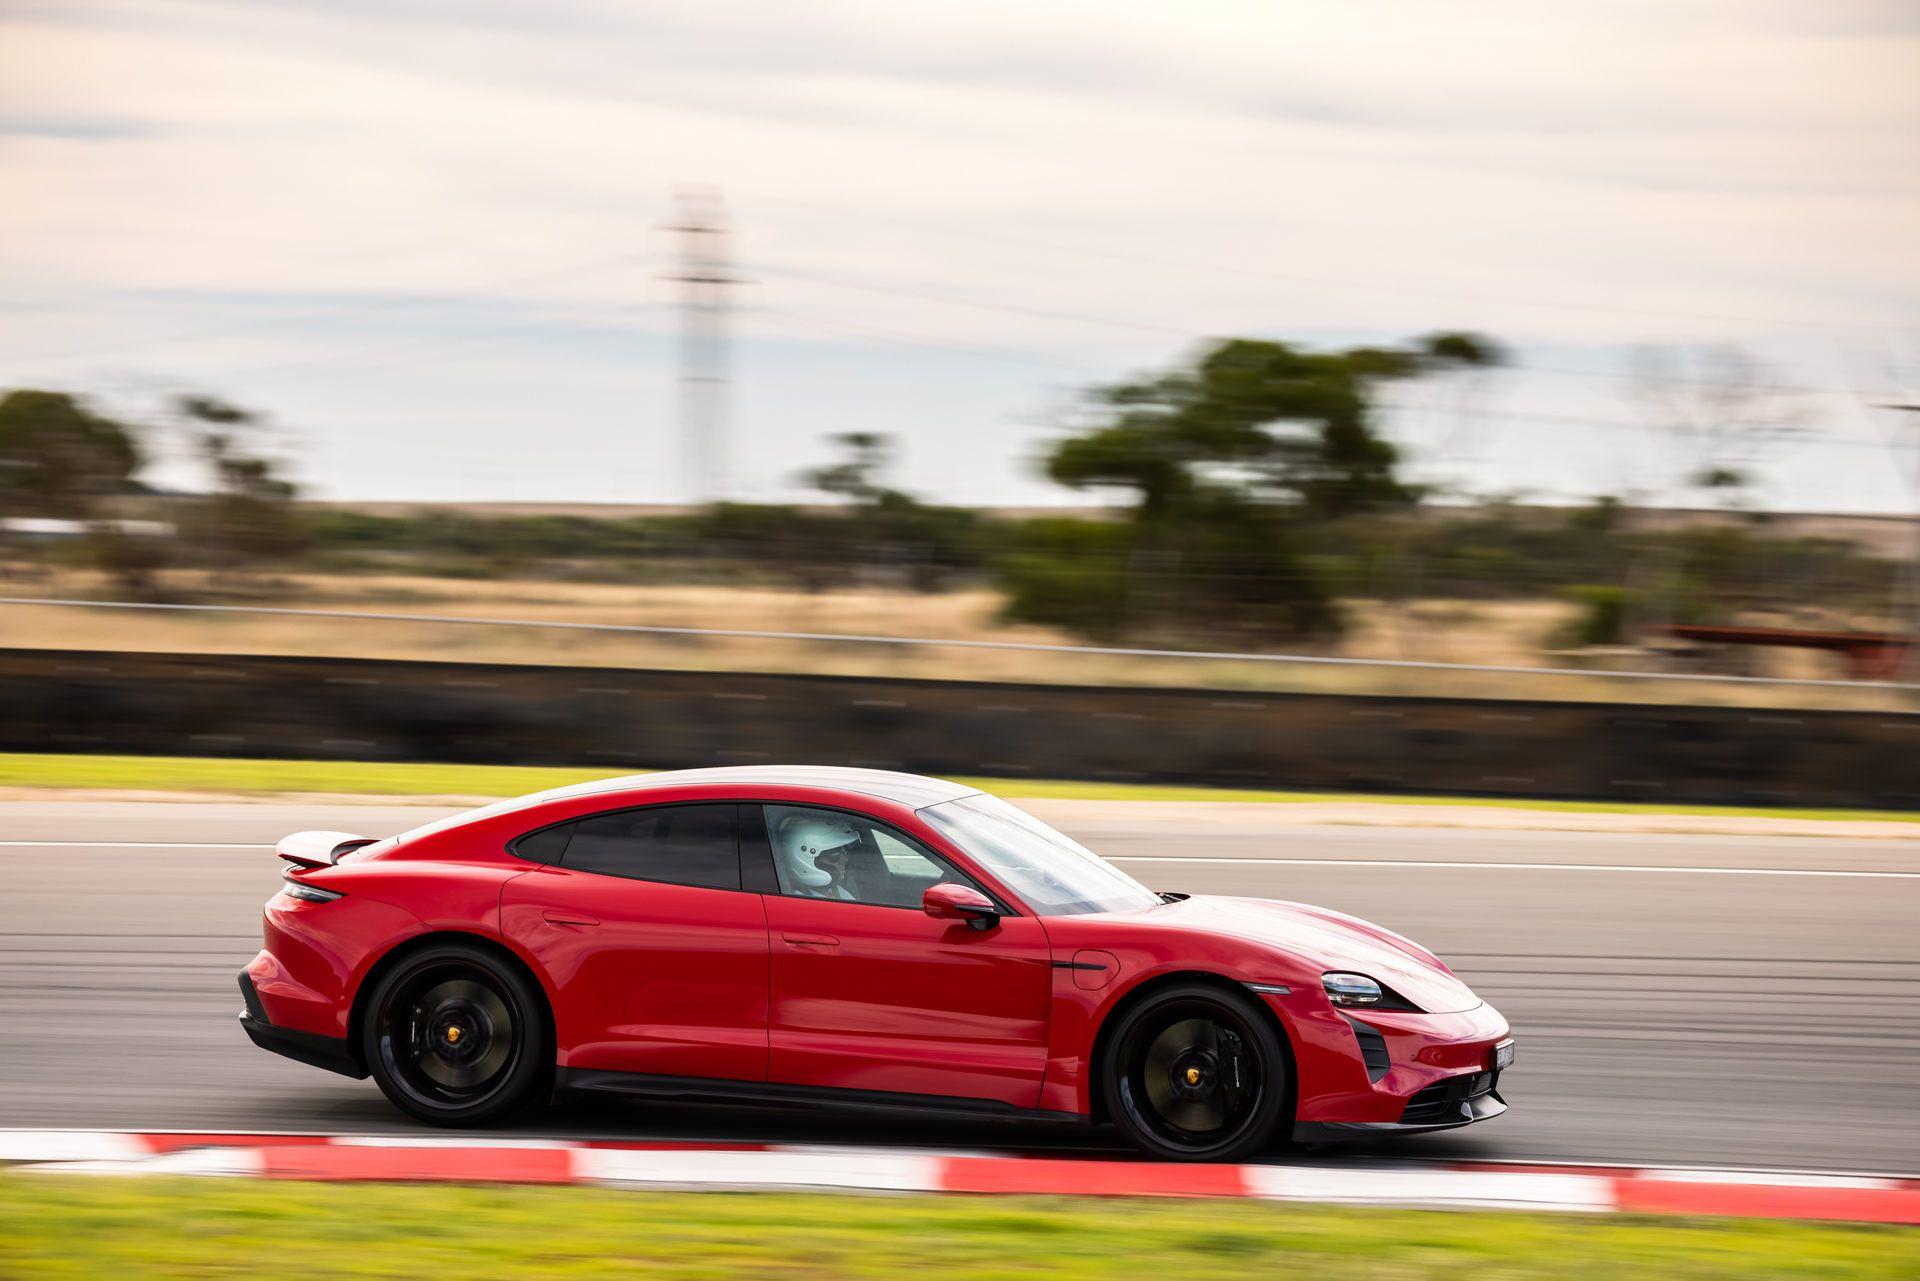 Porsche-Taycan-Turbo-S-The-Bend-Motorsport-Park-10